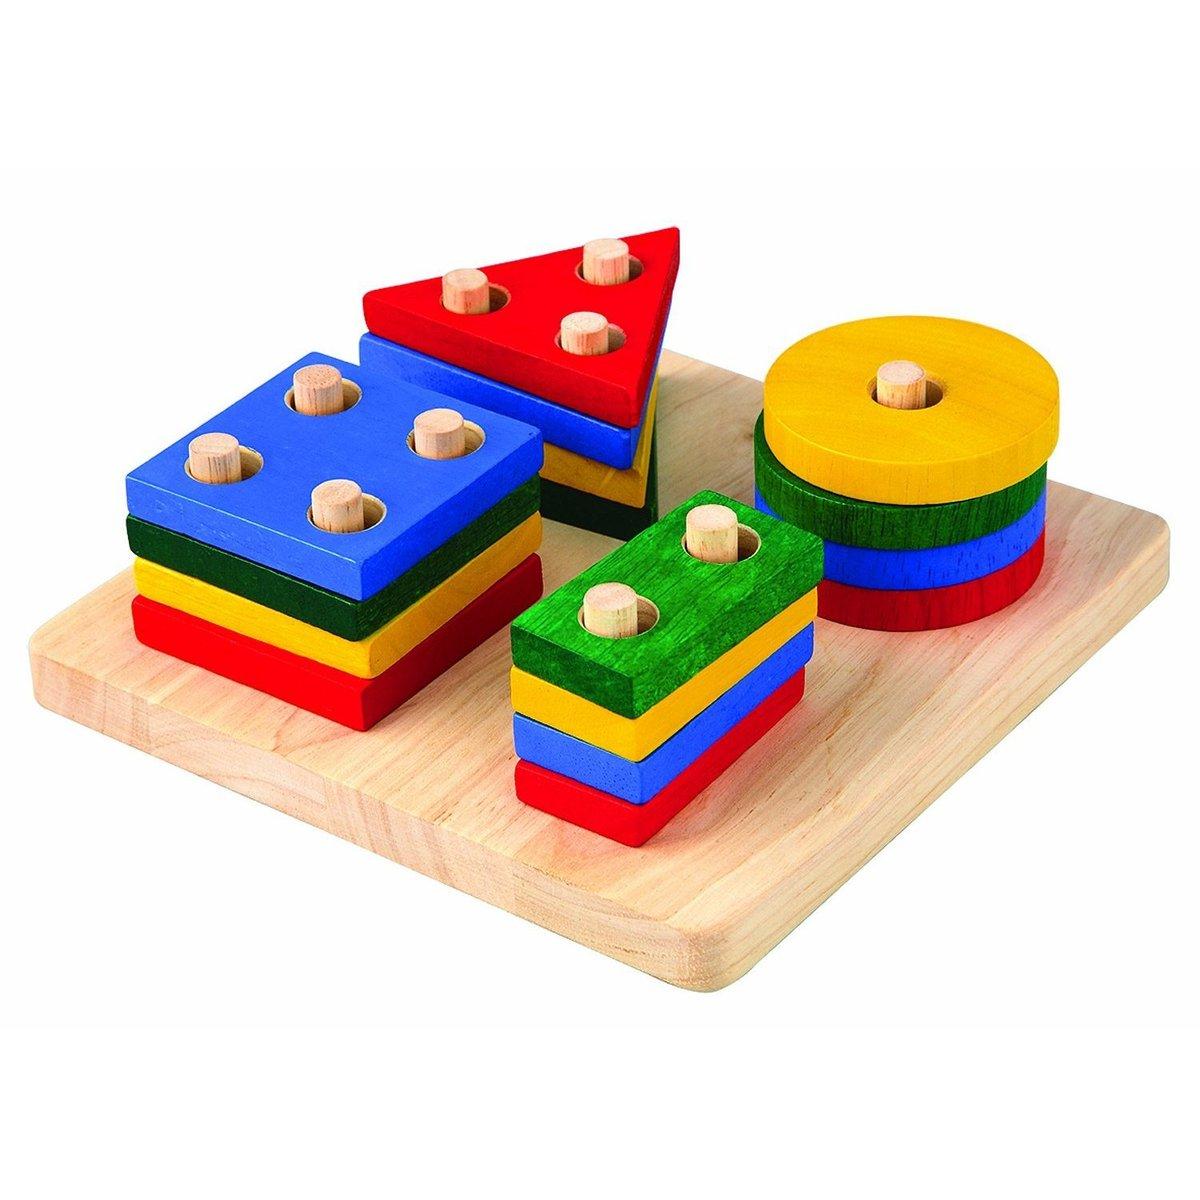 246c024521 Προσθήκη στα αγαπημένα menu Plan Toys Βάση Ταξινόμησης 2403